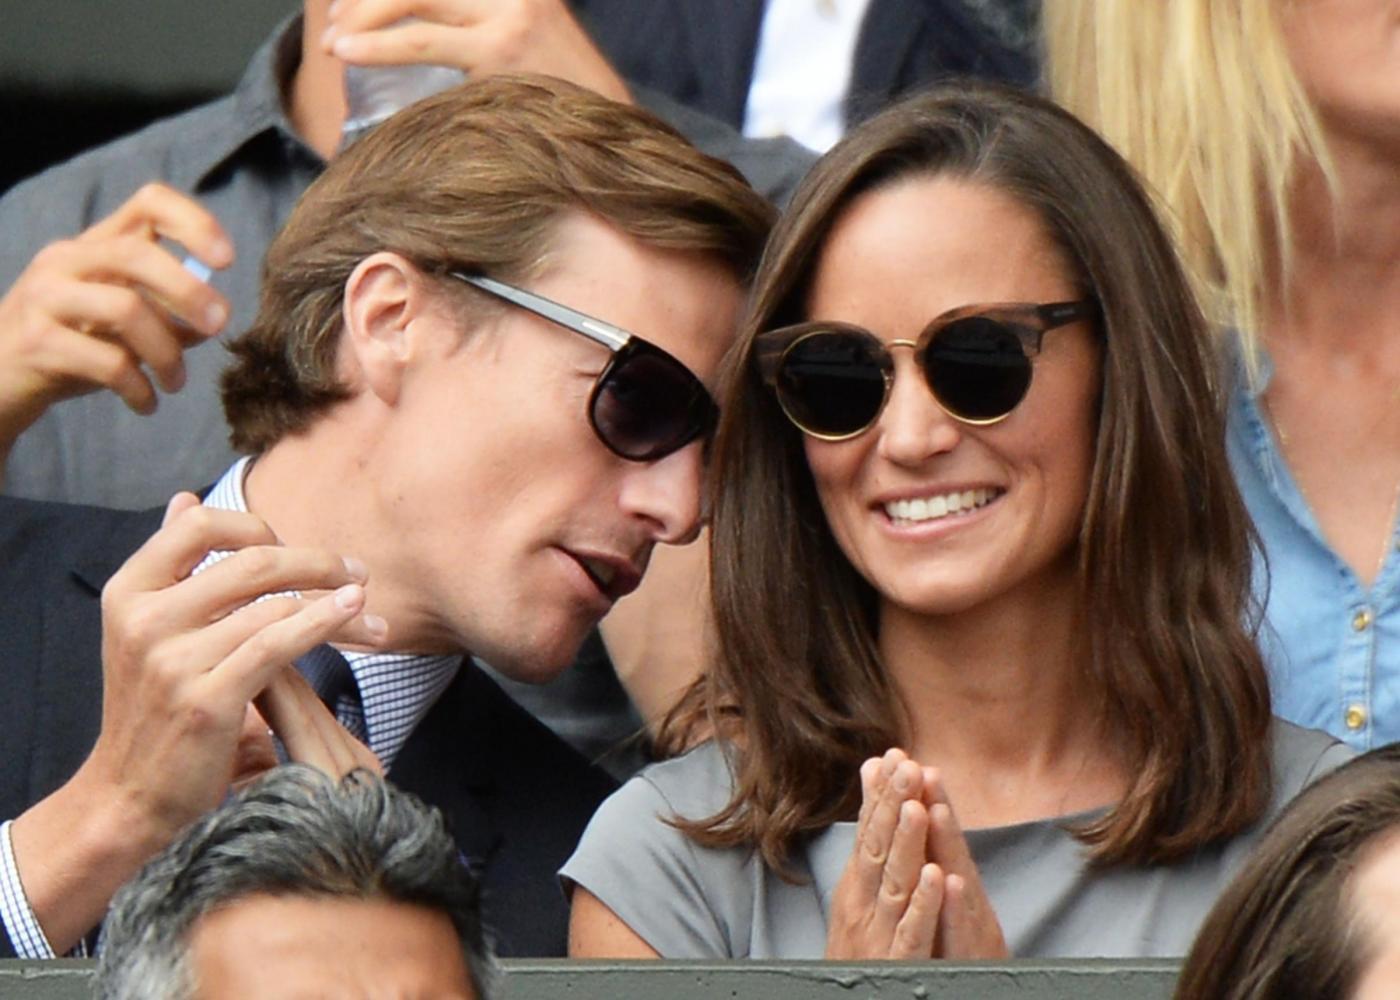 Wimbledon: Kate e William, Pippa Middleton e la madre, David e Victoria Beckham10